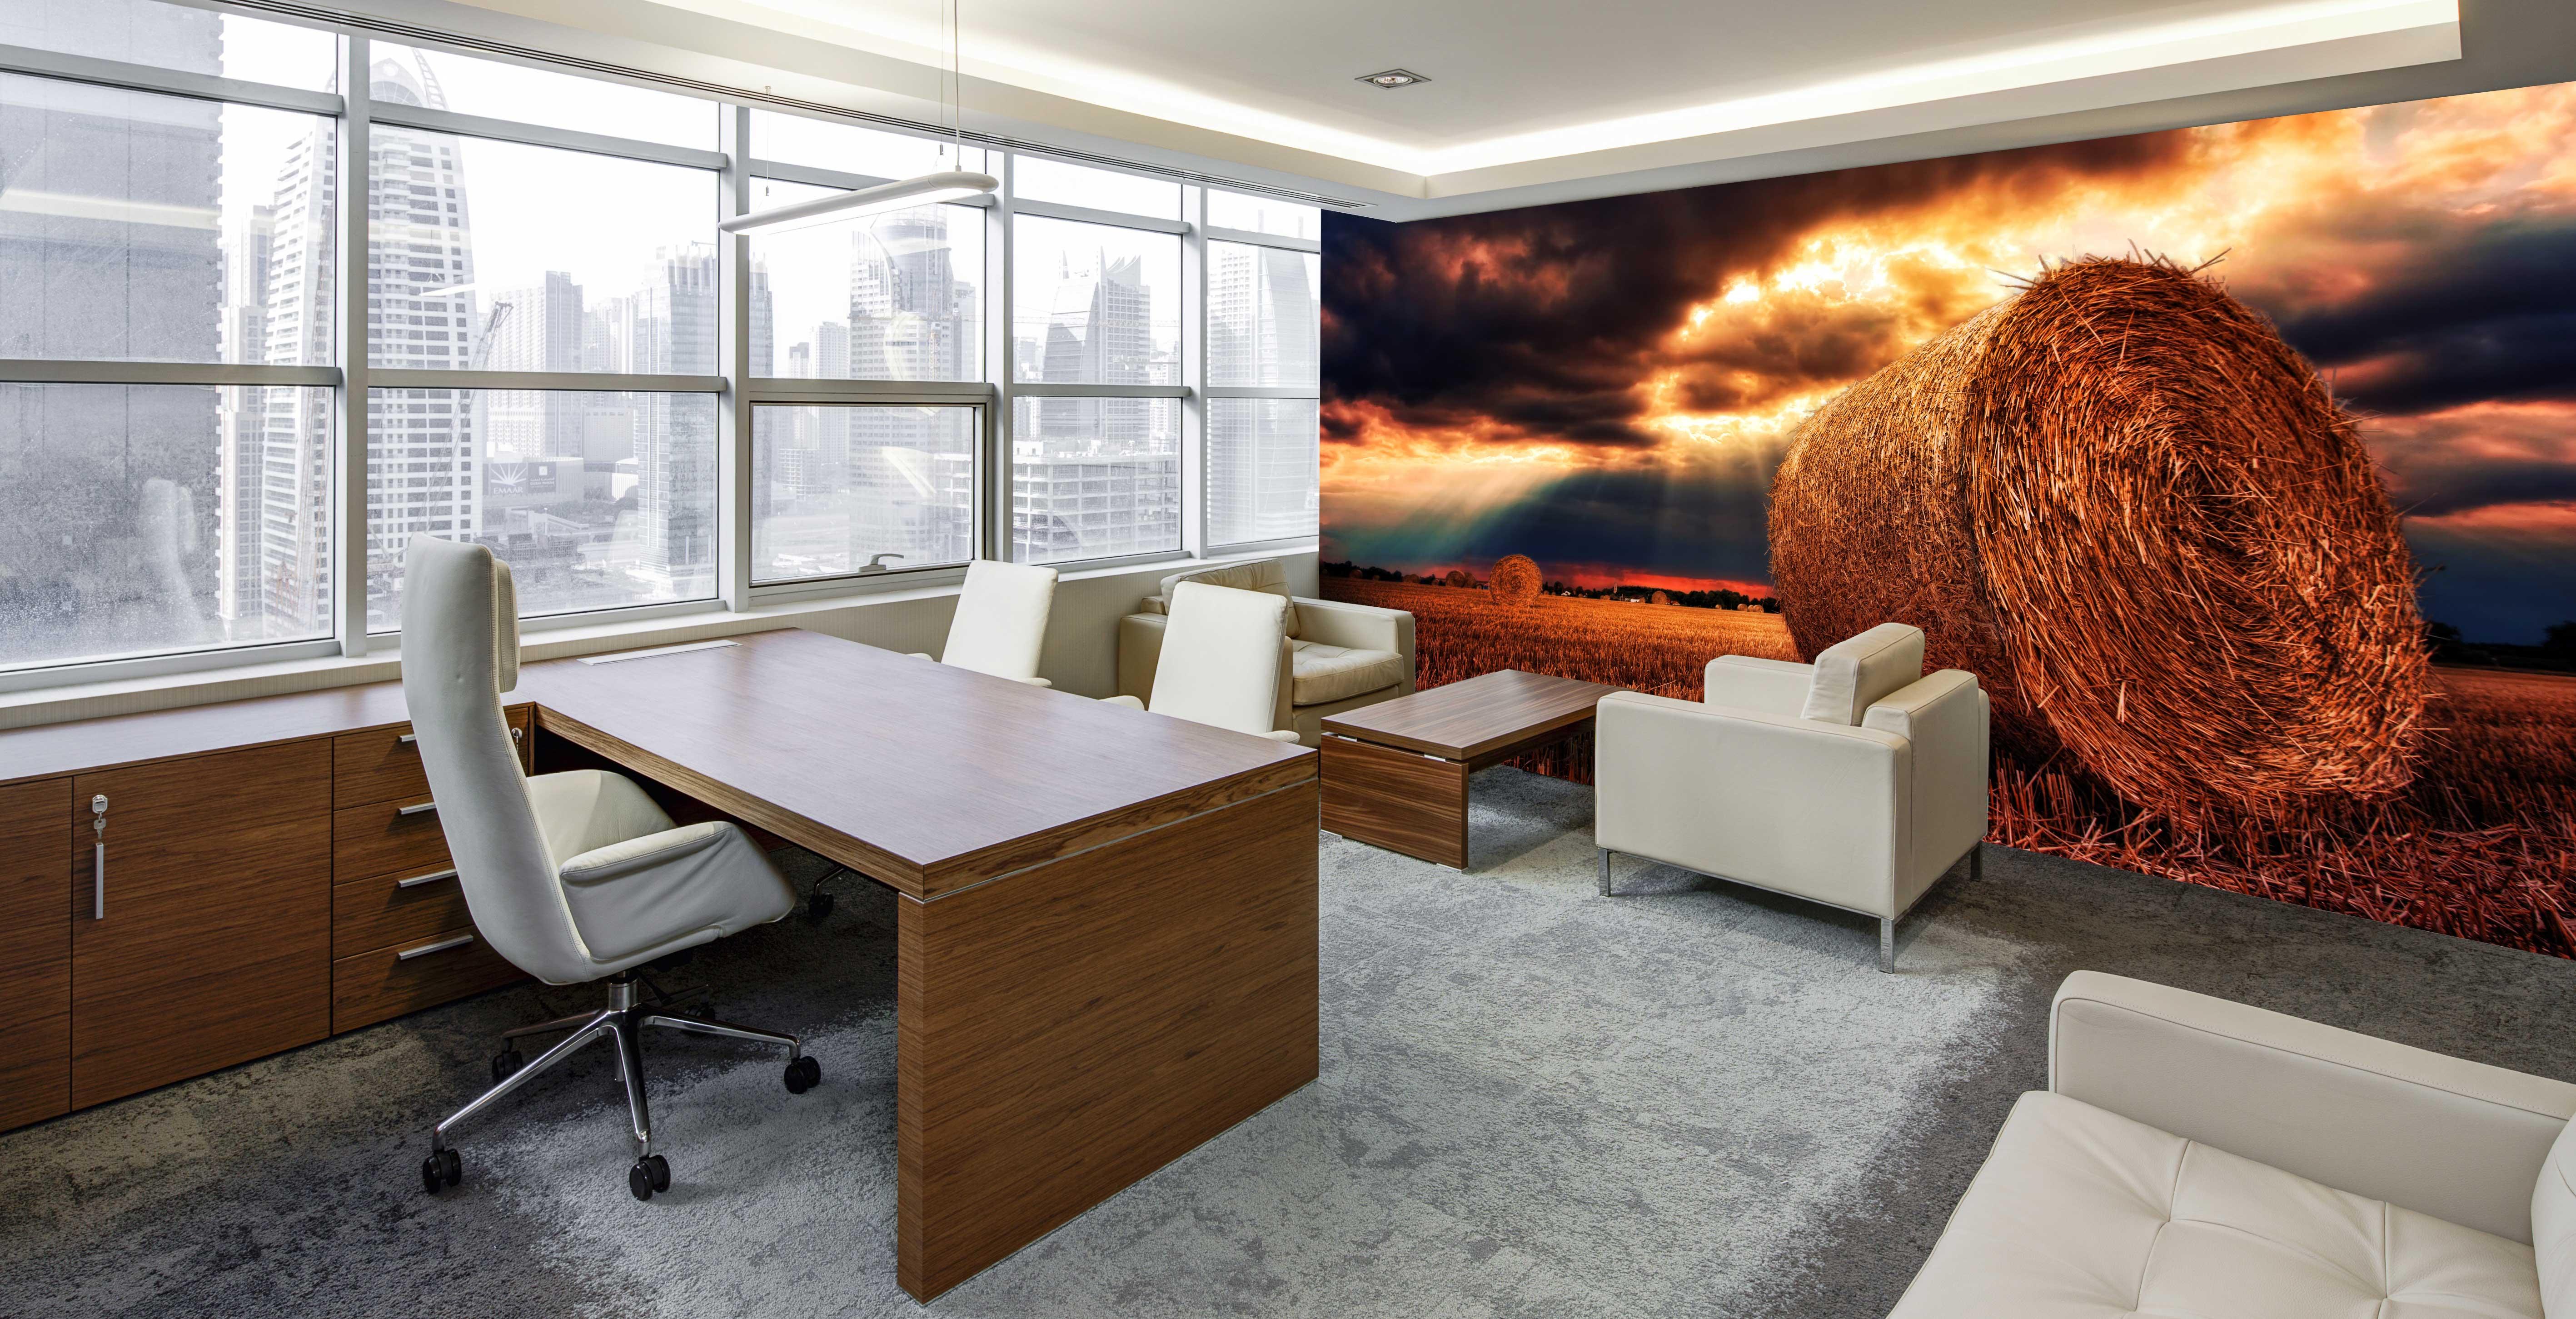 behangdoeken.nl airtex kantoor